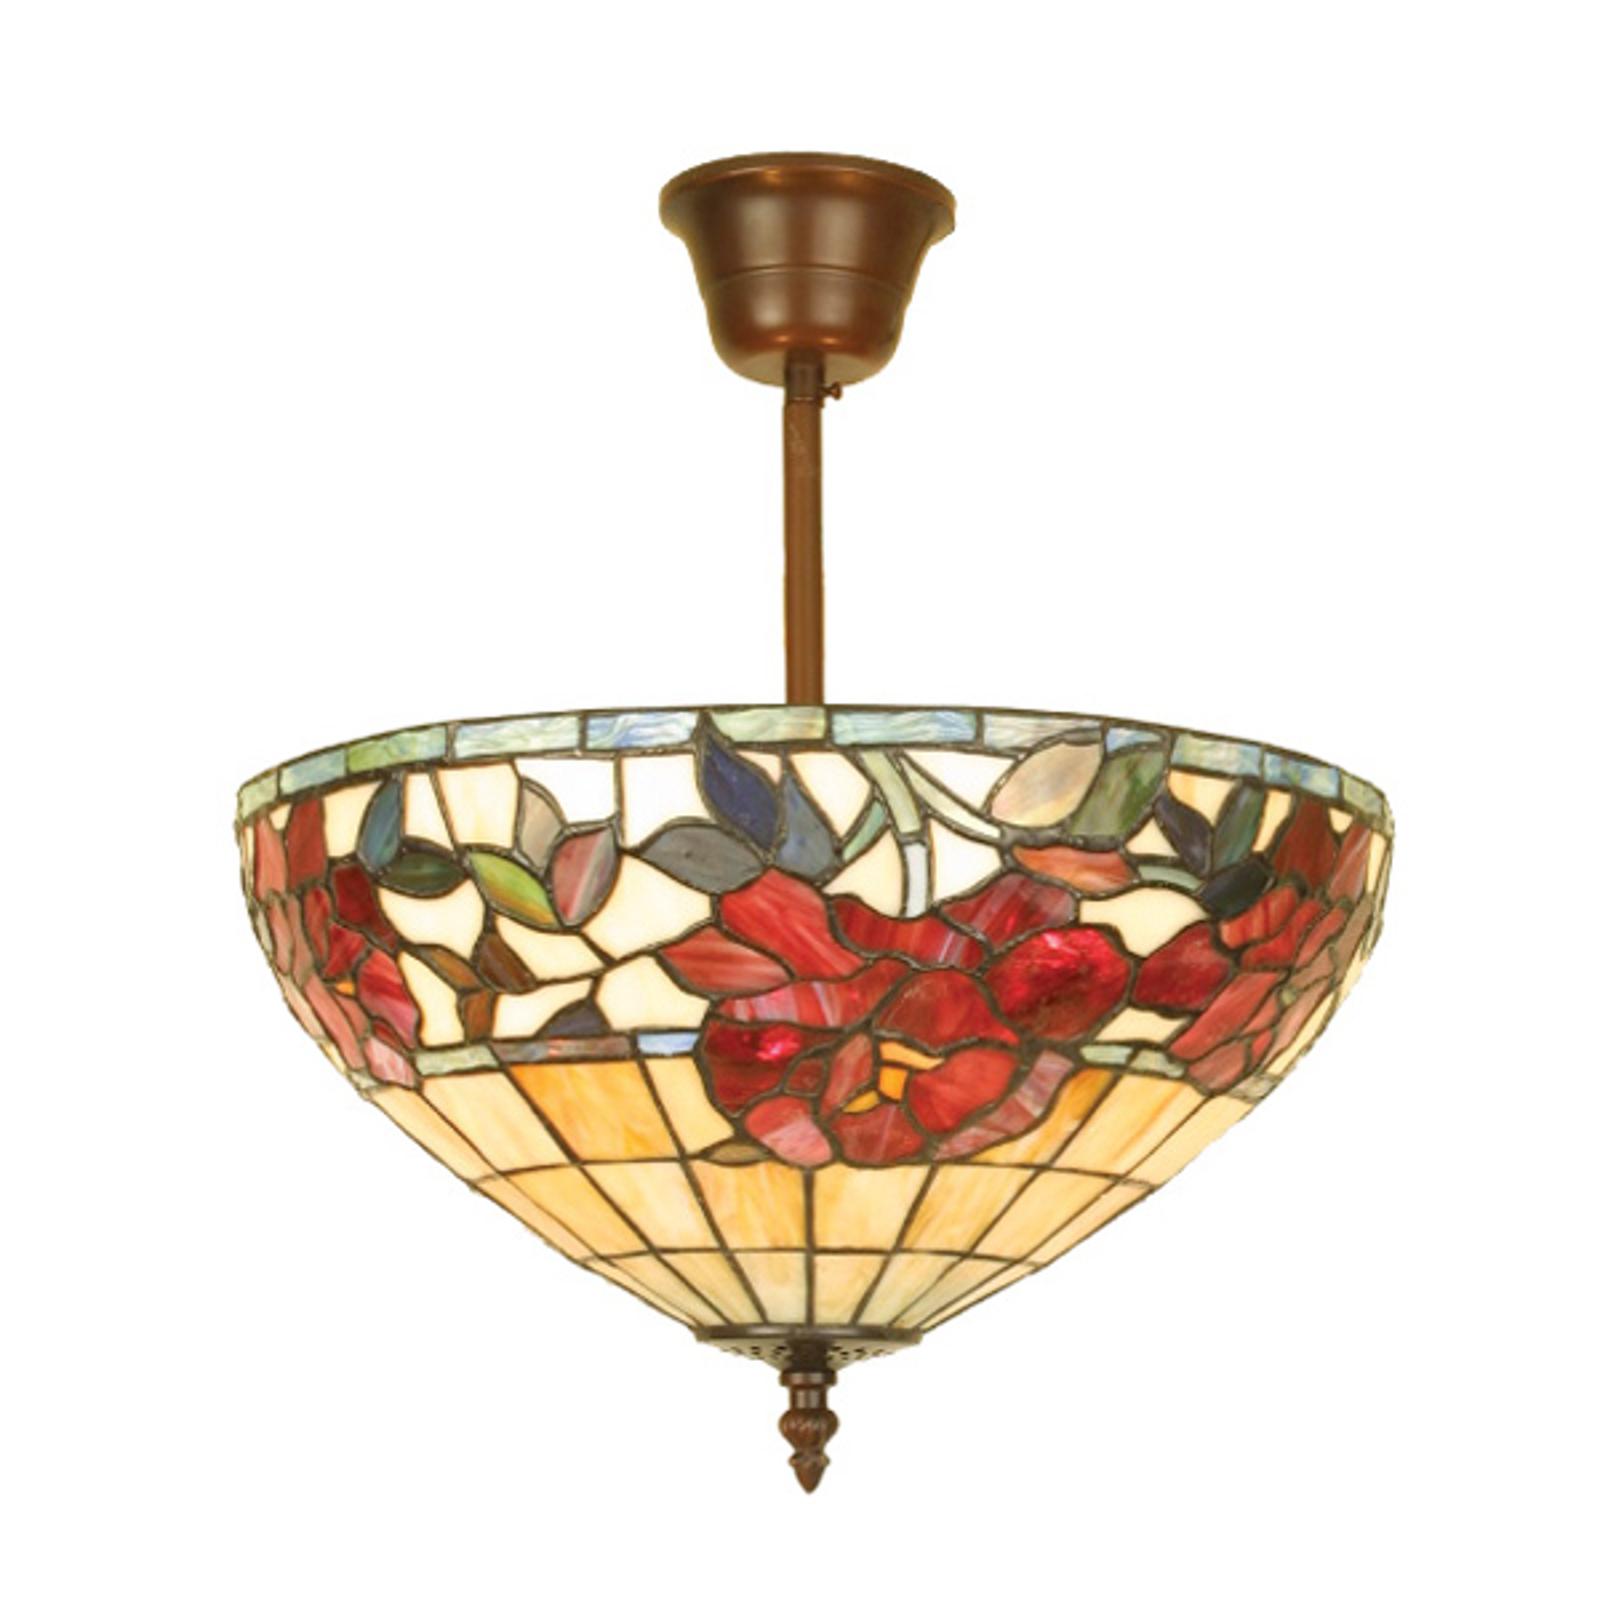 Plafondlamp Finna in Tiffany-stijl